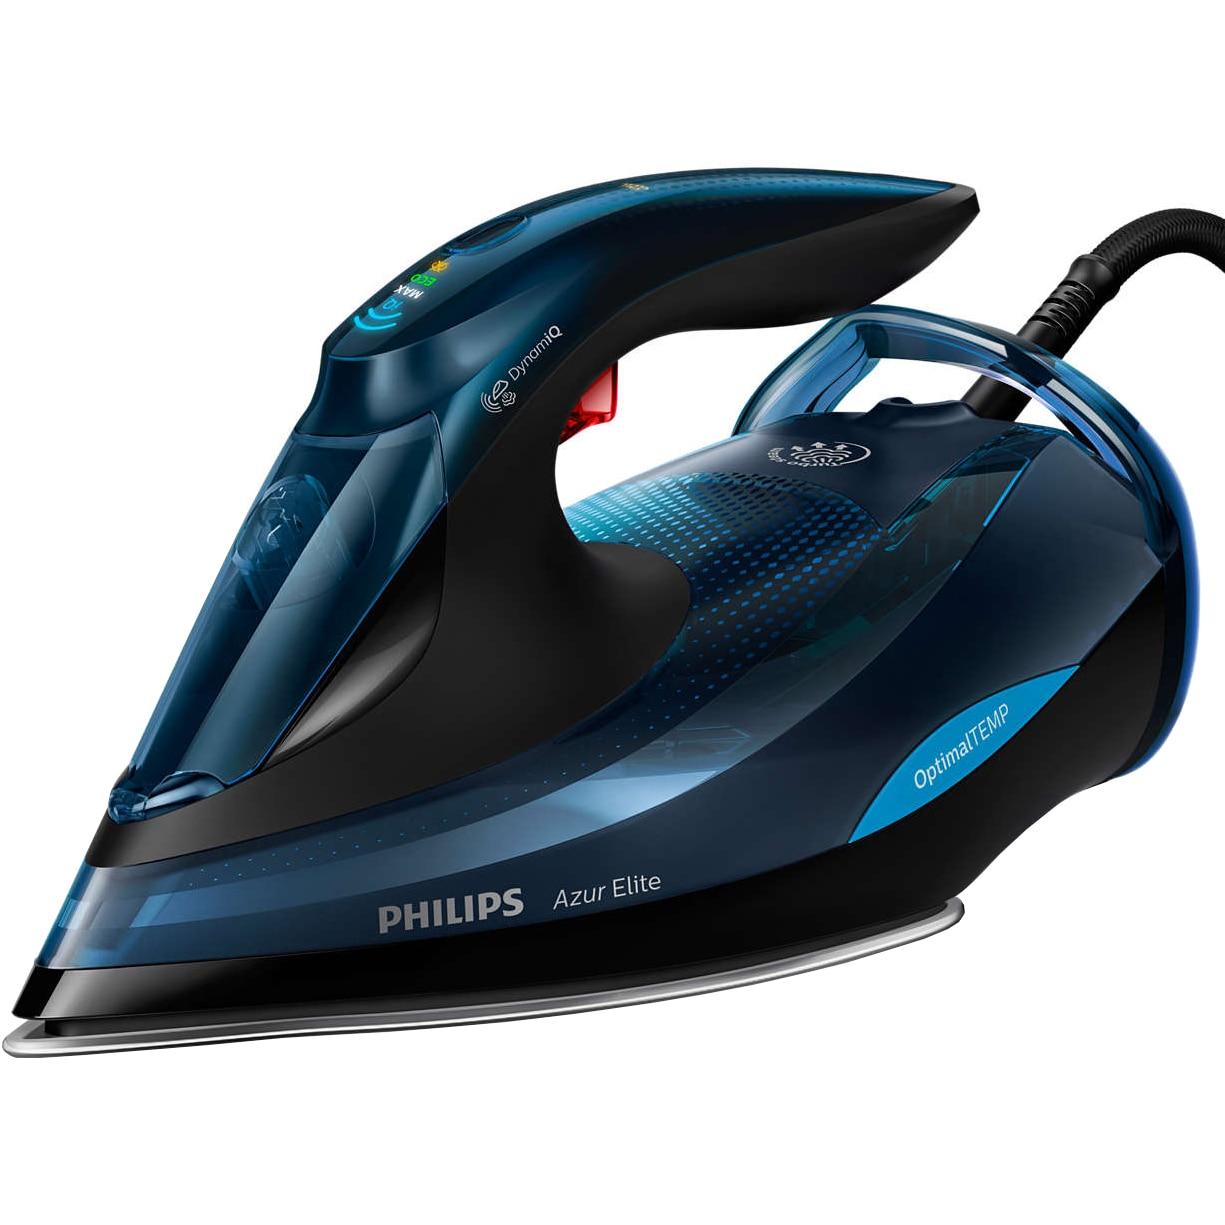 Fotografie Fier de calcat Philips Azur Elite GC5034/20, 3000 W, Talpa SteamGlide Plus, Tehnologie OptimalTEMP, 65 g/min, Jet de abur vertical, Albastru/Negru